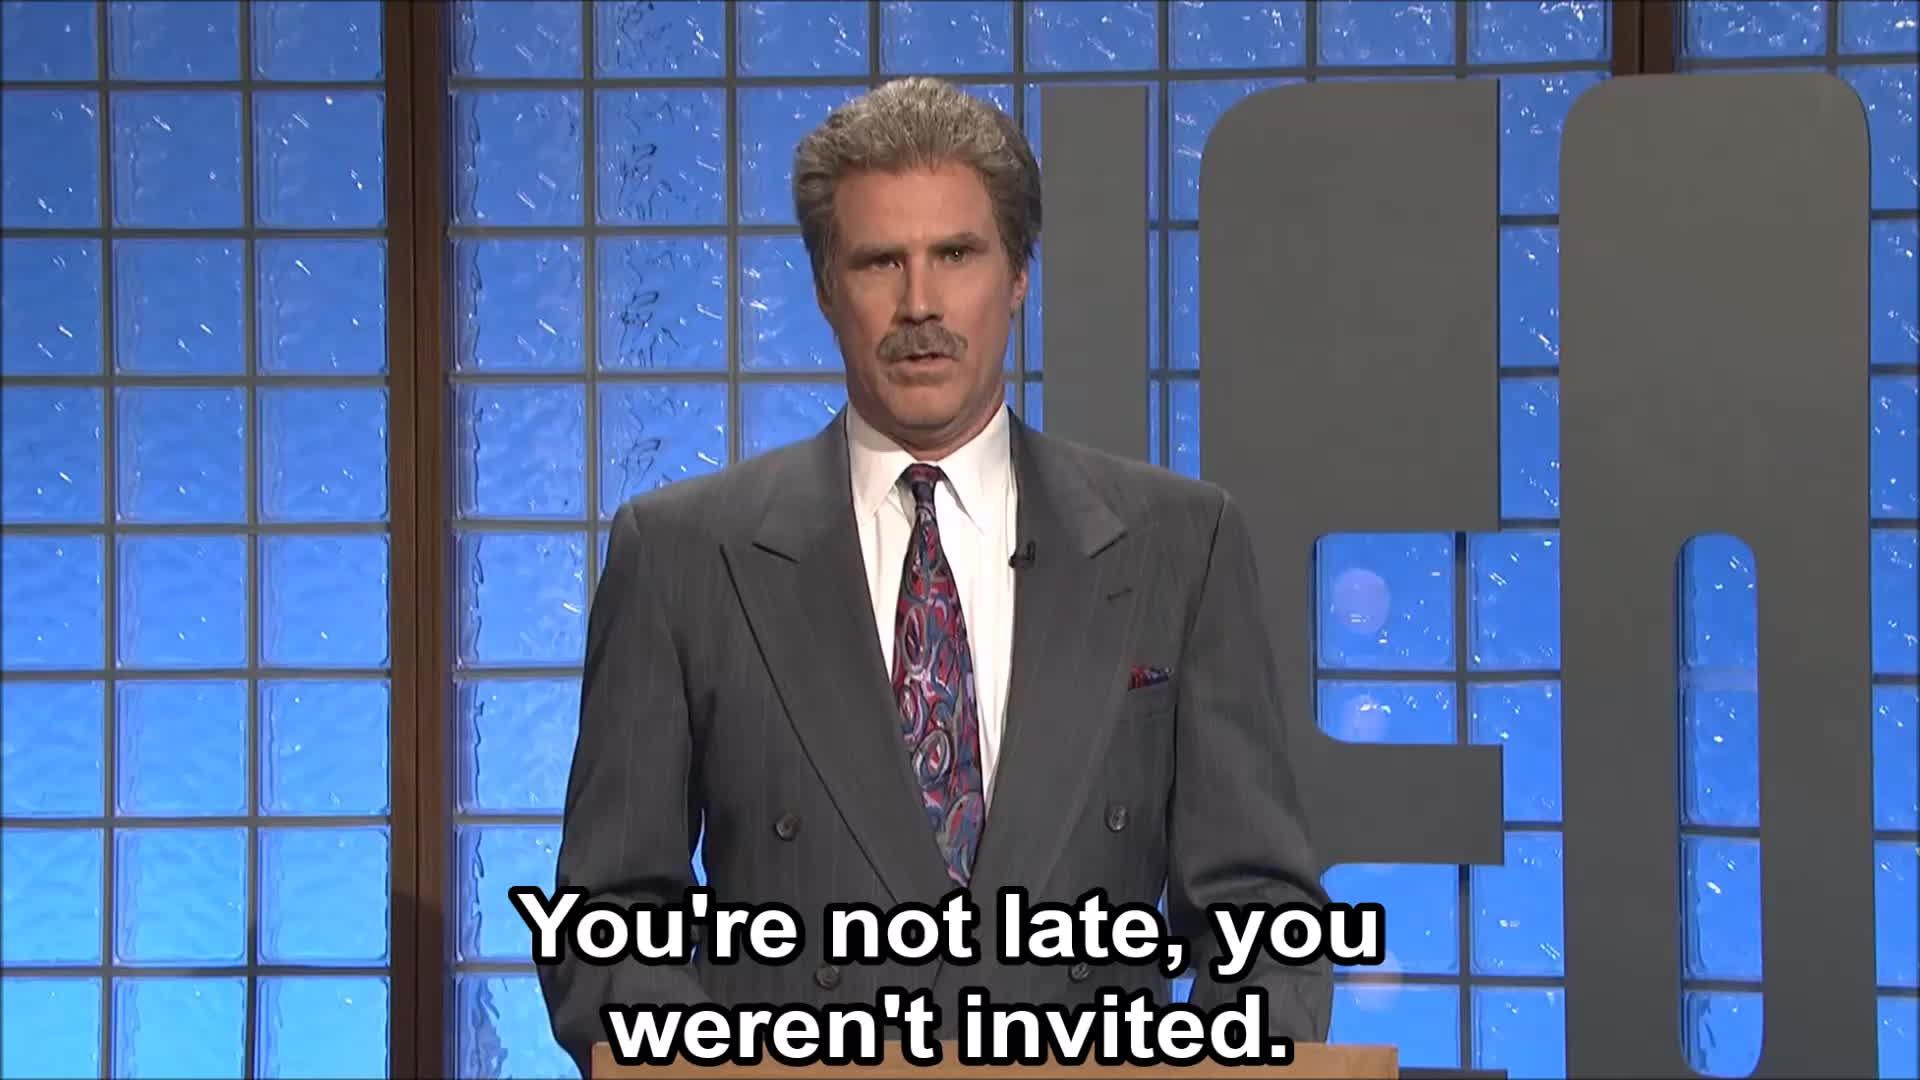 funny, rude, snl, SNL Will Ferrell GIFs